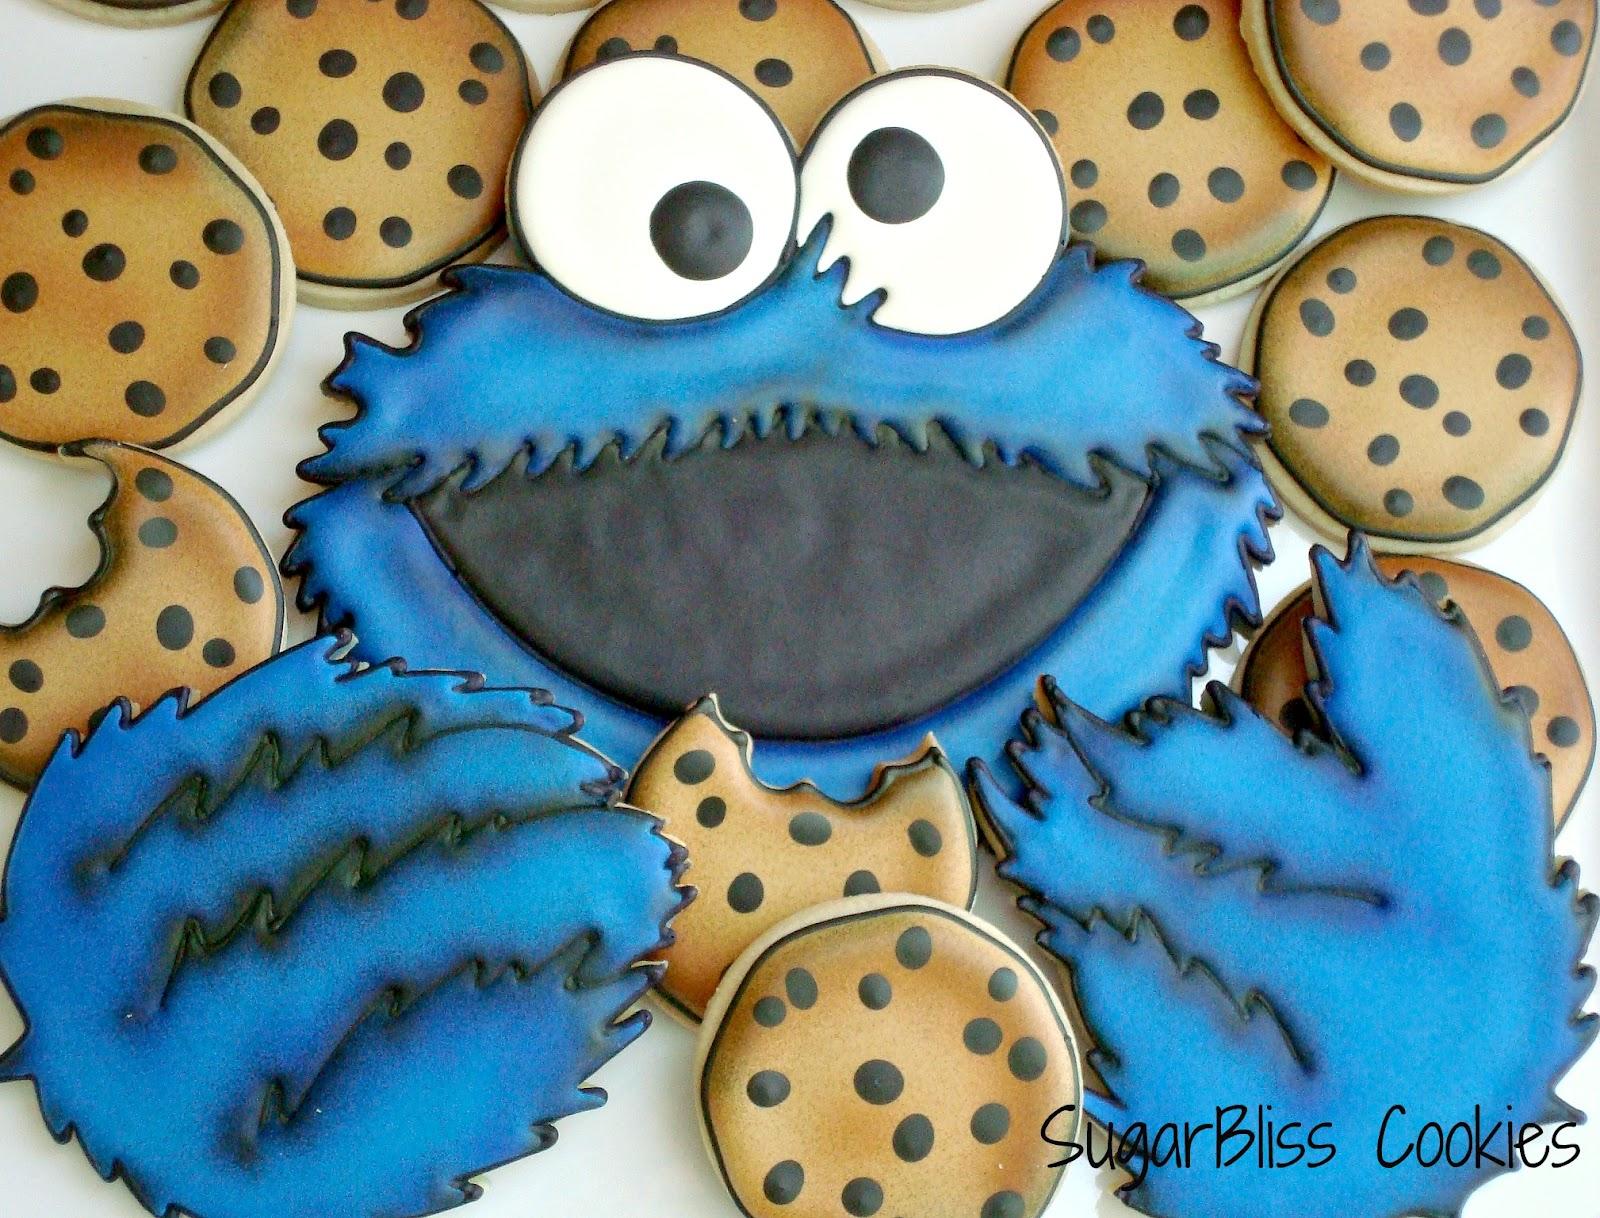 Cookies For Sale Bulldog Inn Athens Ga